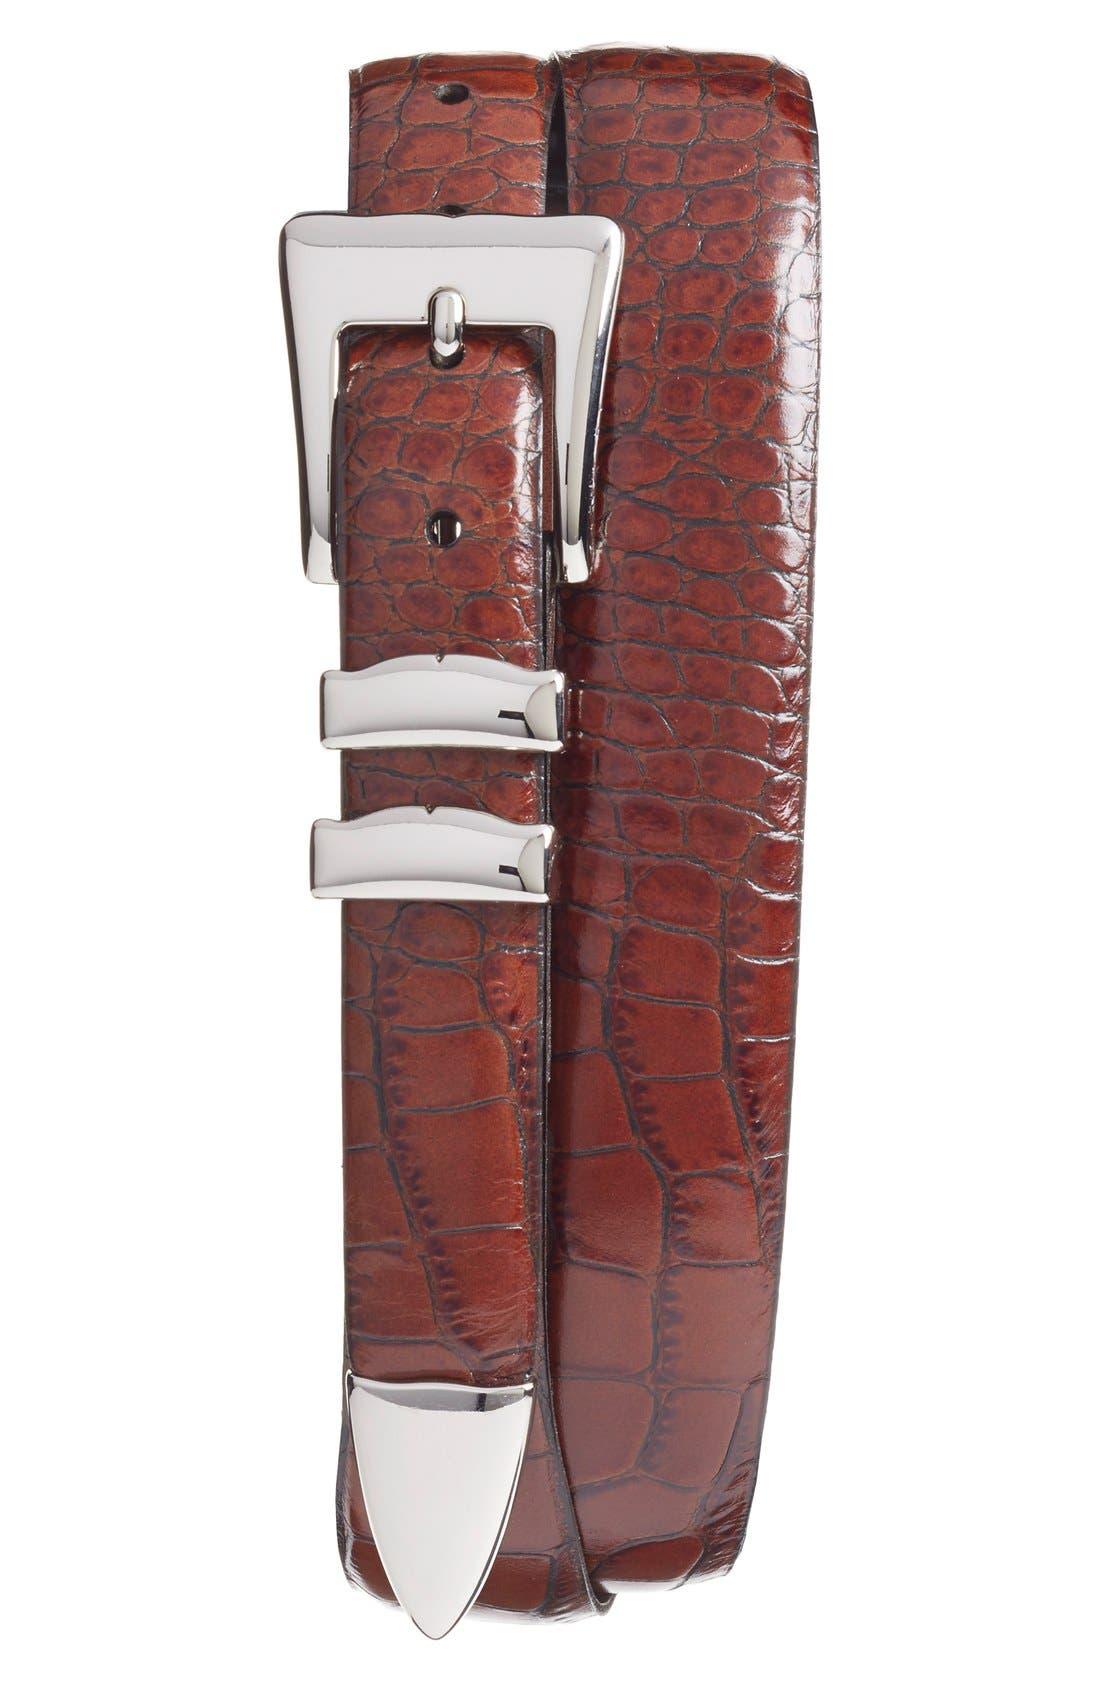 Main Image - Torino Belts Alligator Embossed Leather Belt